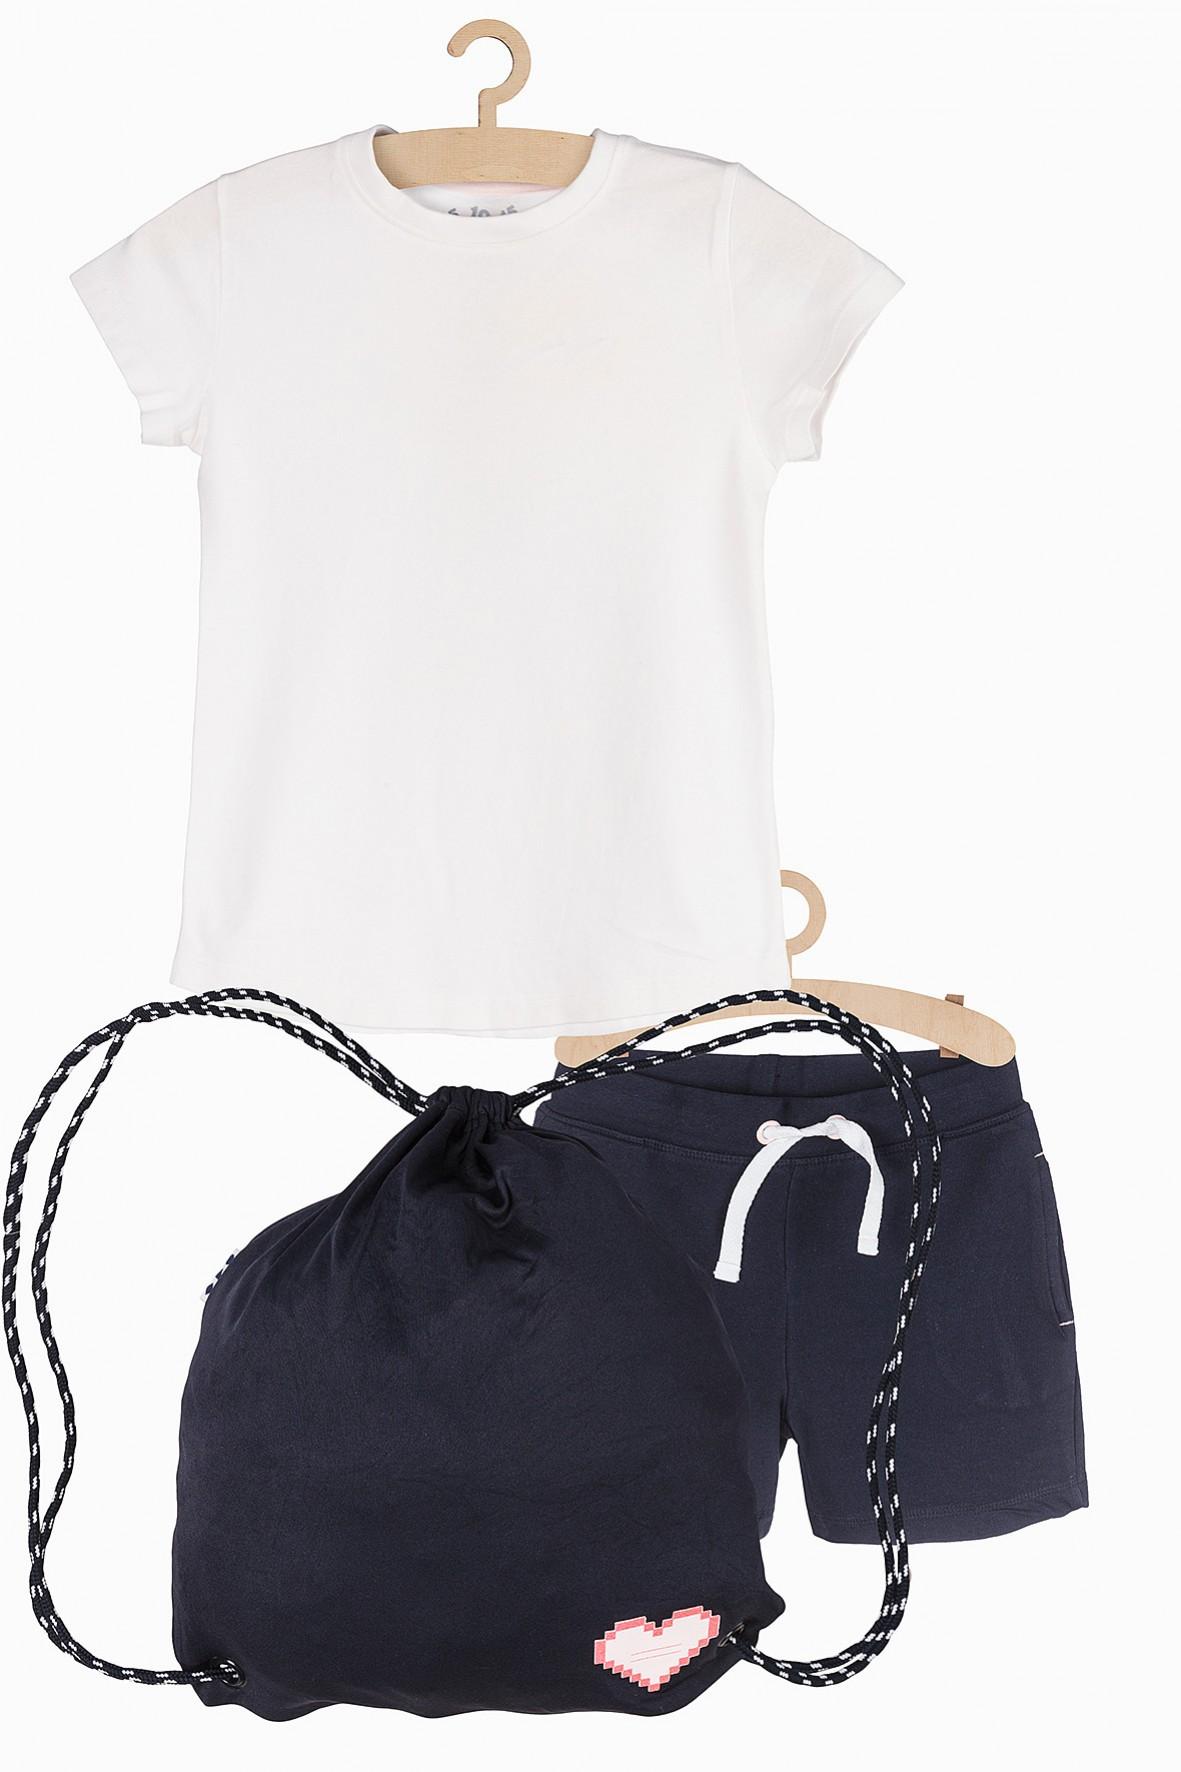 Komplet ubrań na gimnastykę- koszulka spodenki i worek na kapcie